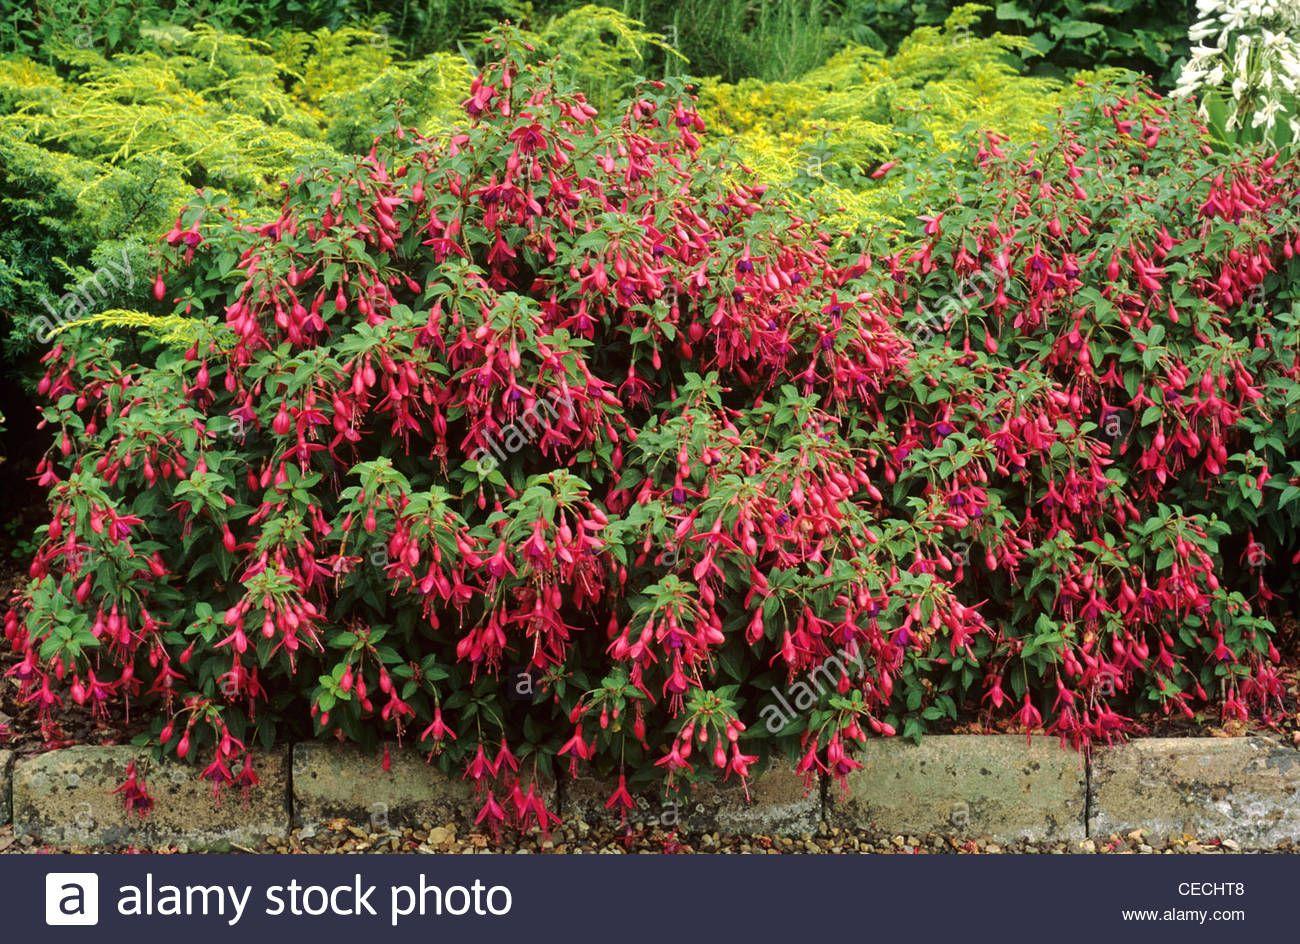 Garden Design Garden Plants Astilbes Hostas Fuchsia And Astilbes 2020 Modern